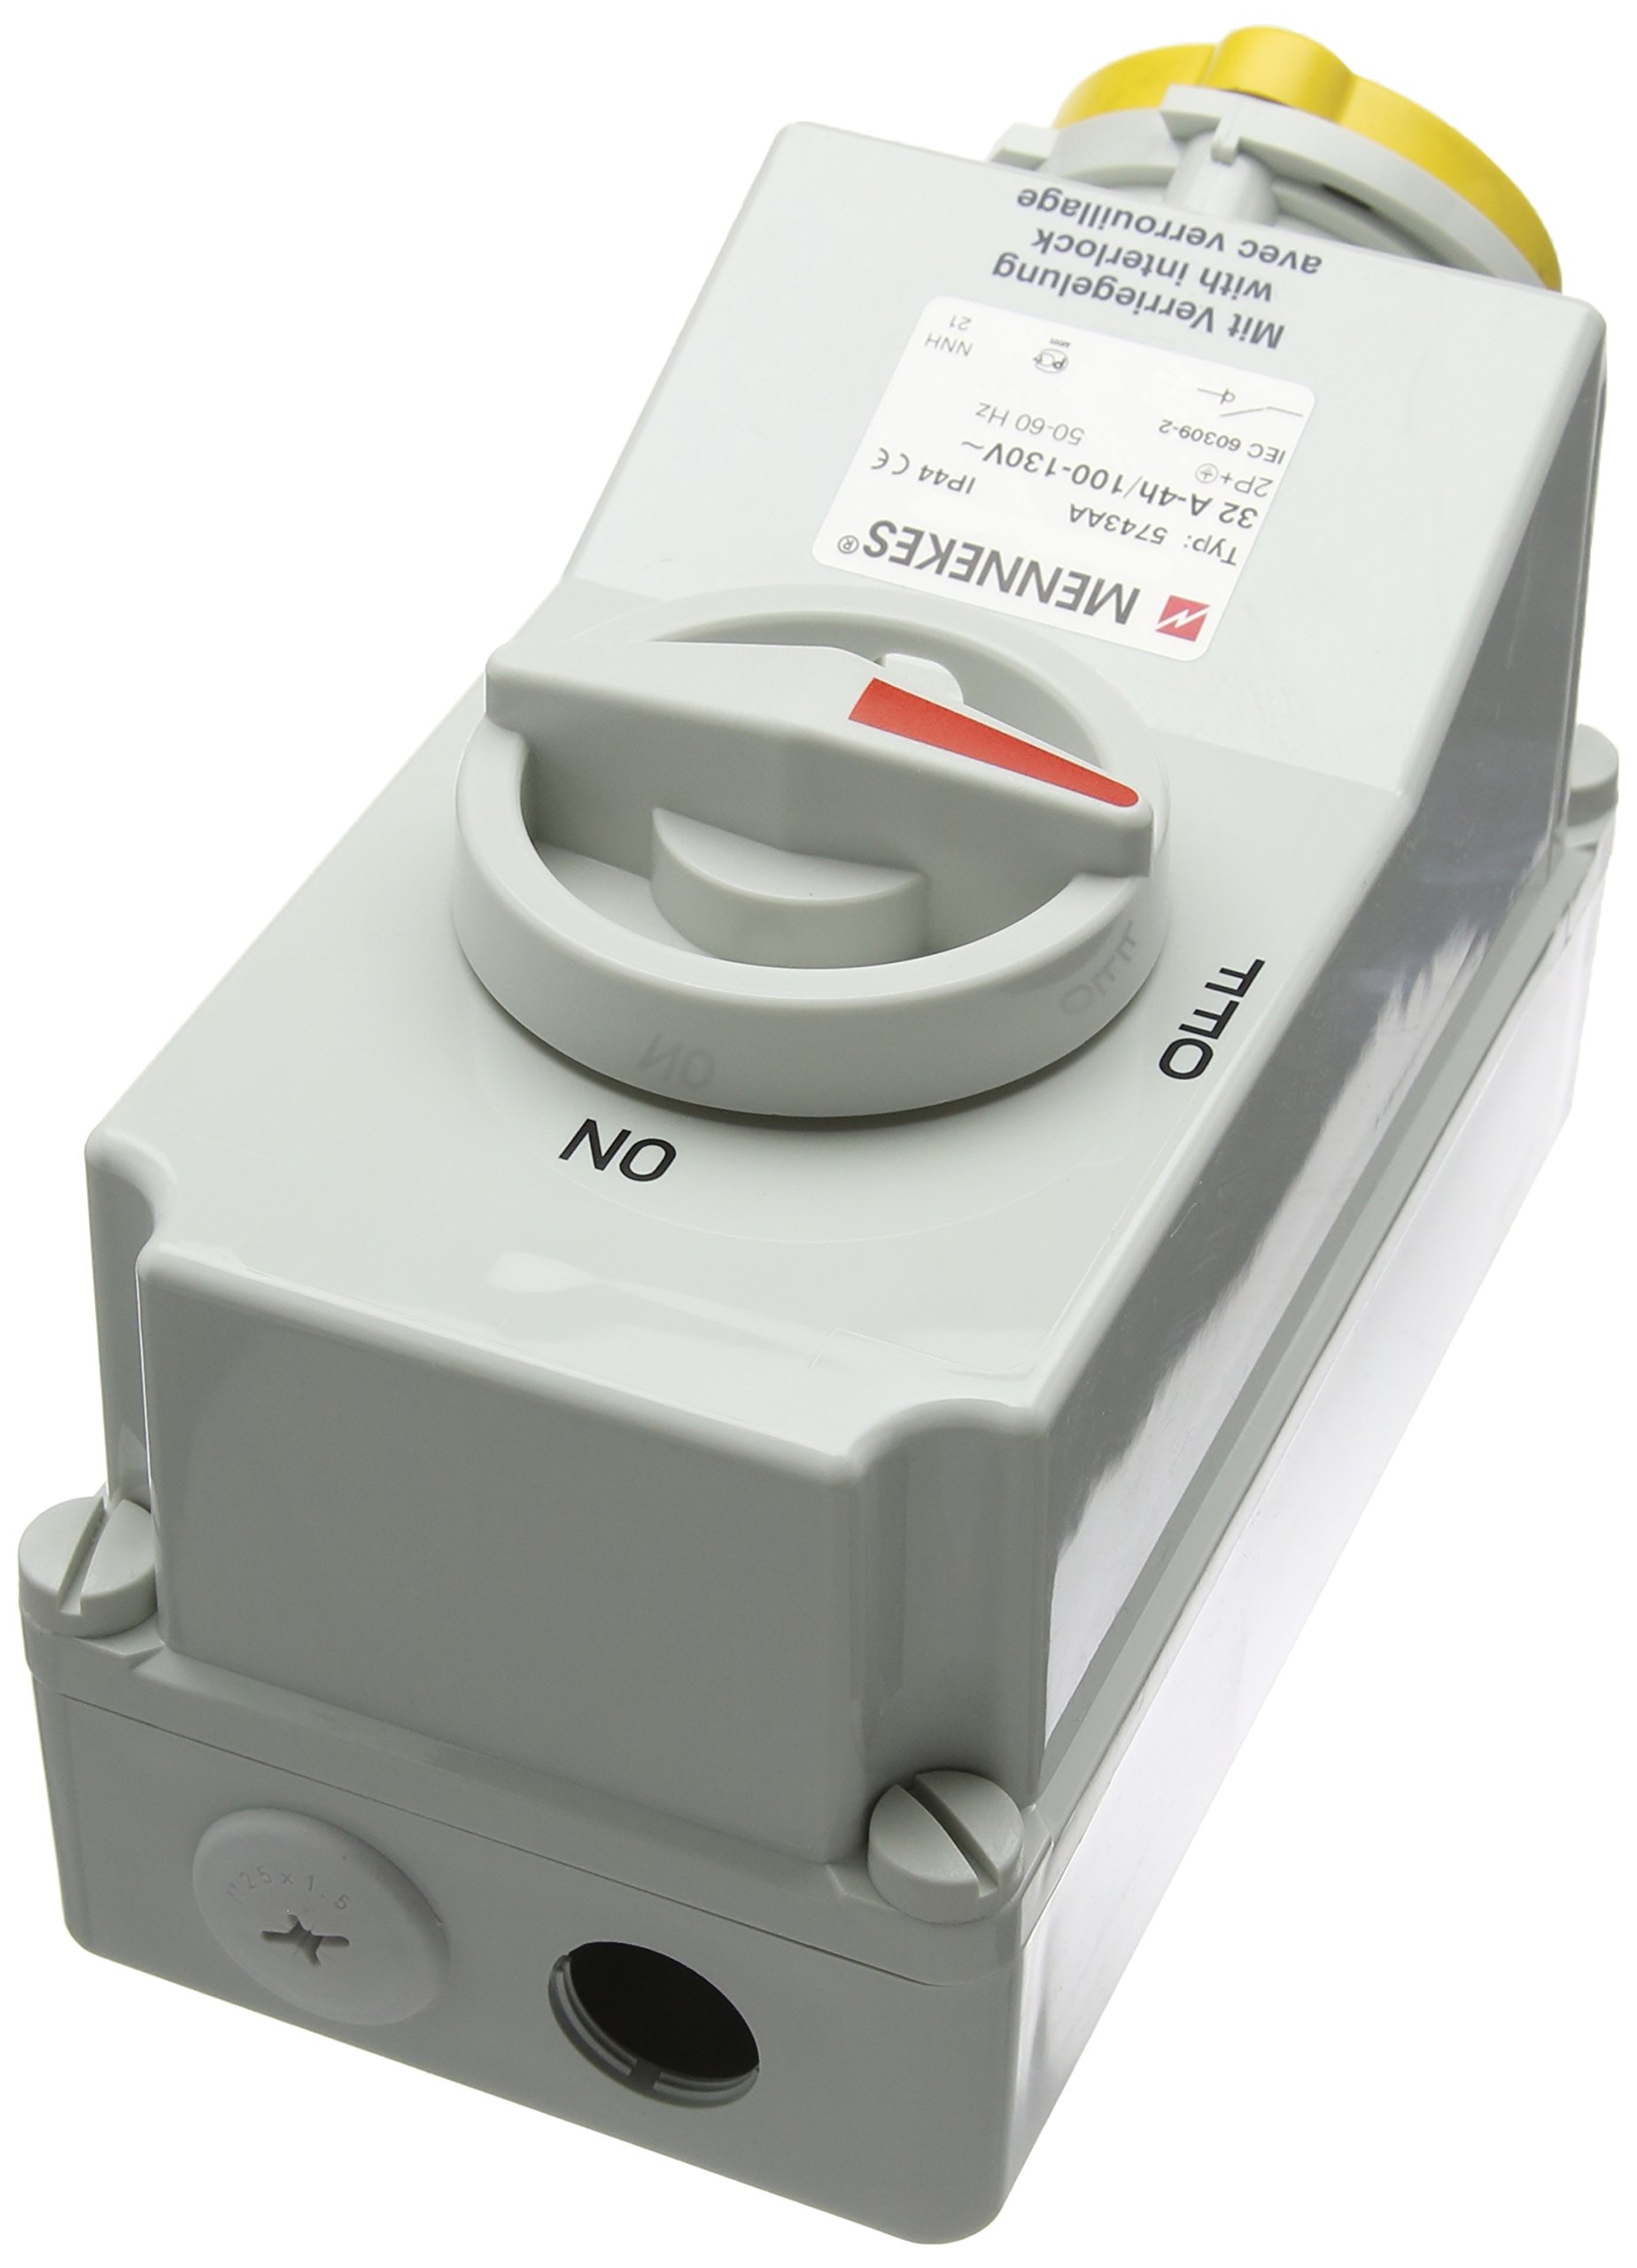 Typ 100 16A 3PIN 110V IP44 Top and Bottom Entry Mennekes Wall mounted socket